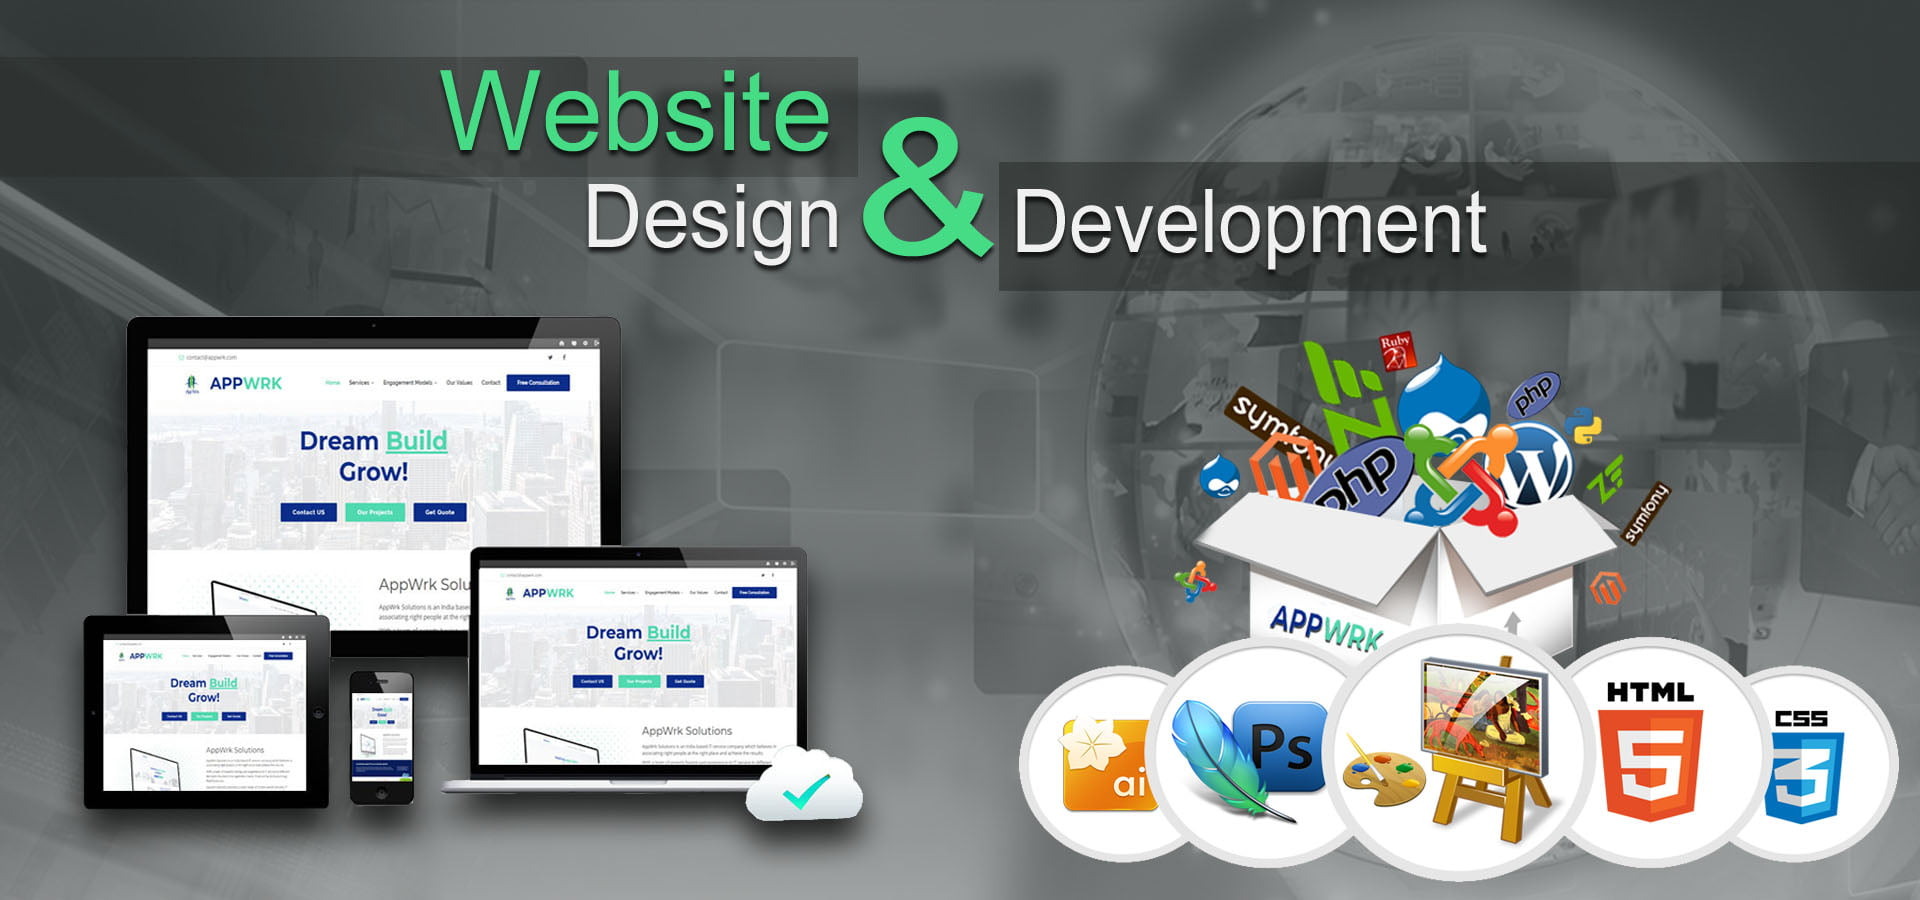 APPWRK IT Solutions Pvt. Ltd.